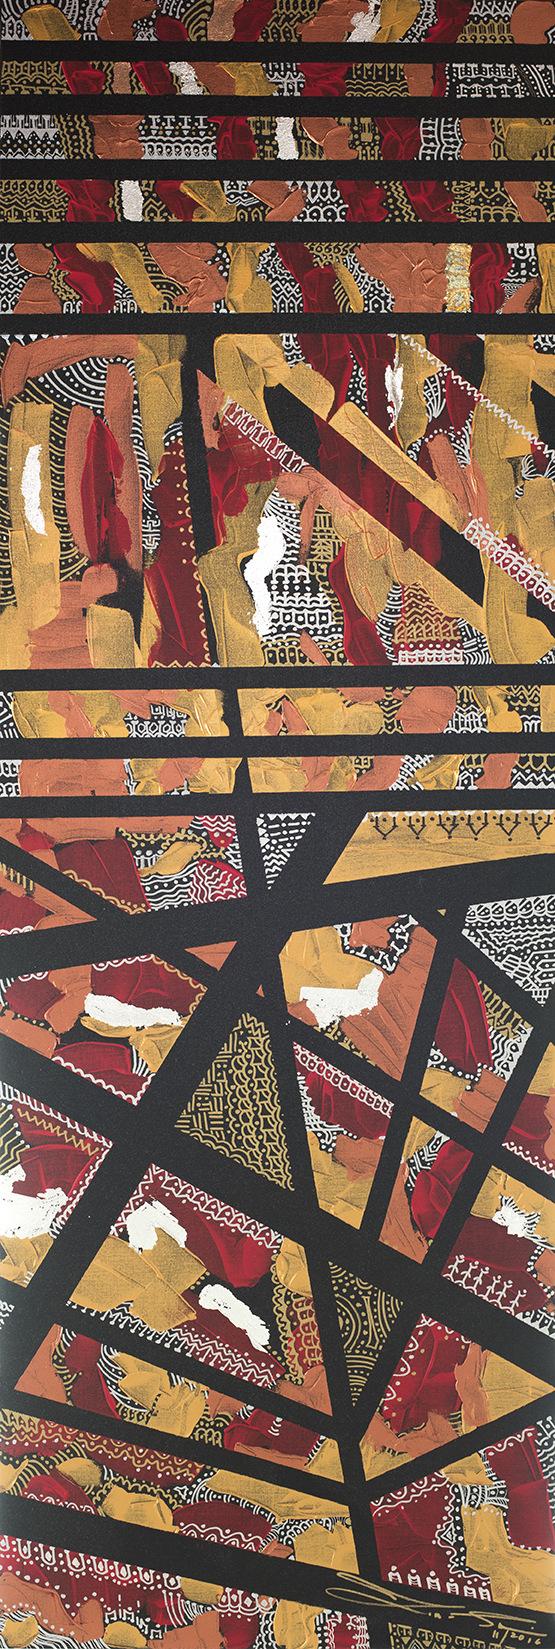 The World is my Canvas - Title : Bantayog na Likha (Monumental Work) Size : 61X184 CM Medium : Acrylic on Canvas & Gold Leaf Artist : Susan V. de Guzman Year : 2016